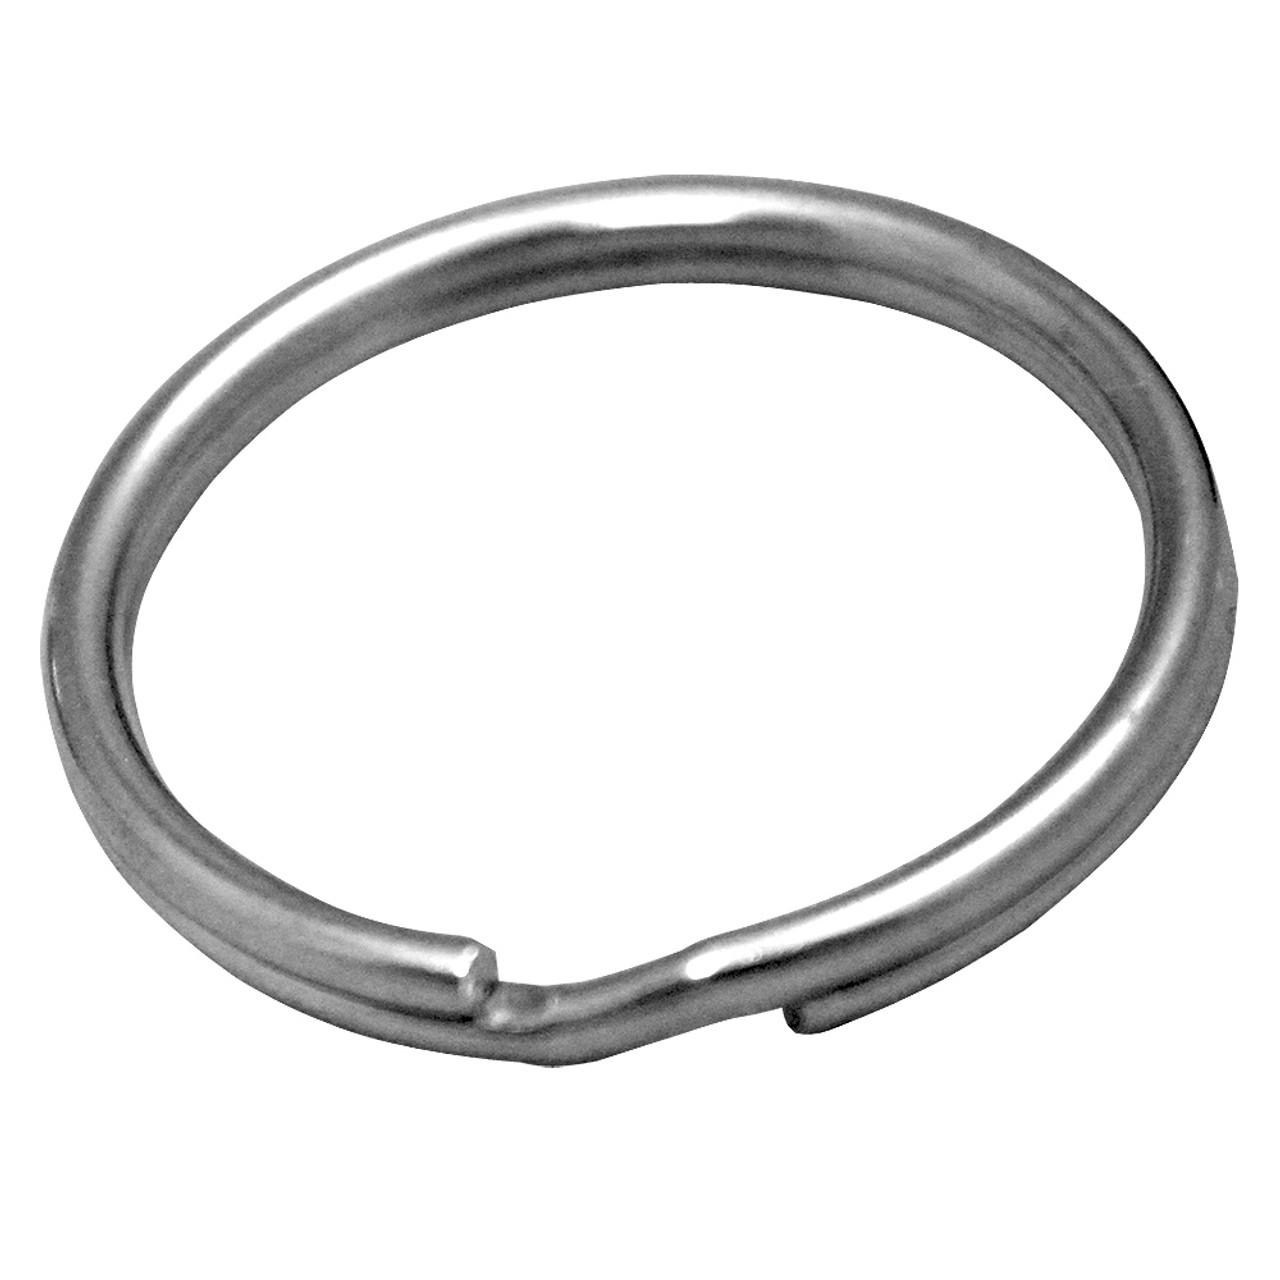 25mm nickel plated split key ring.